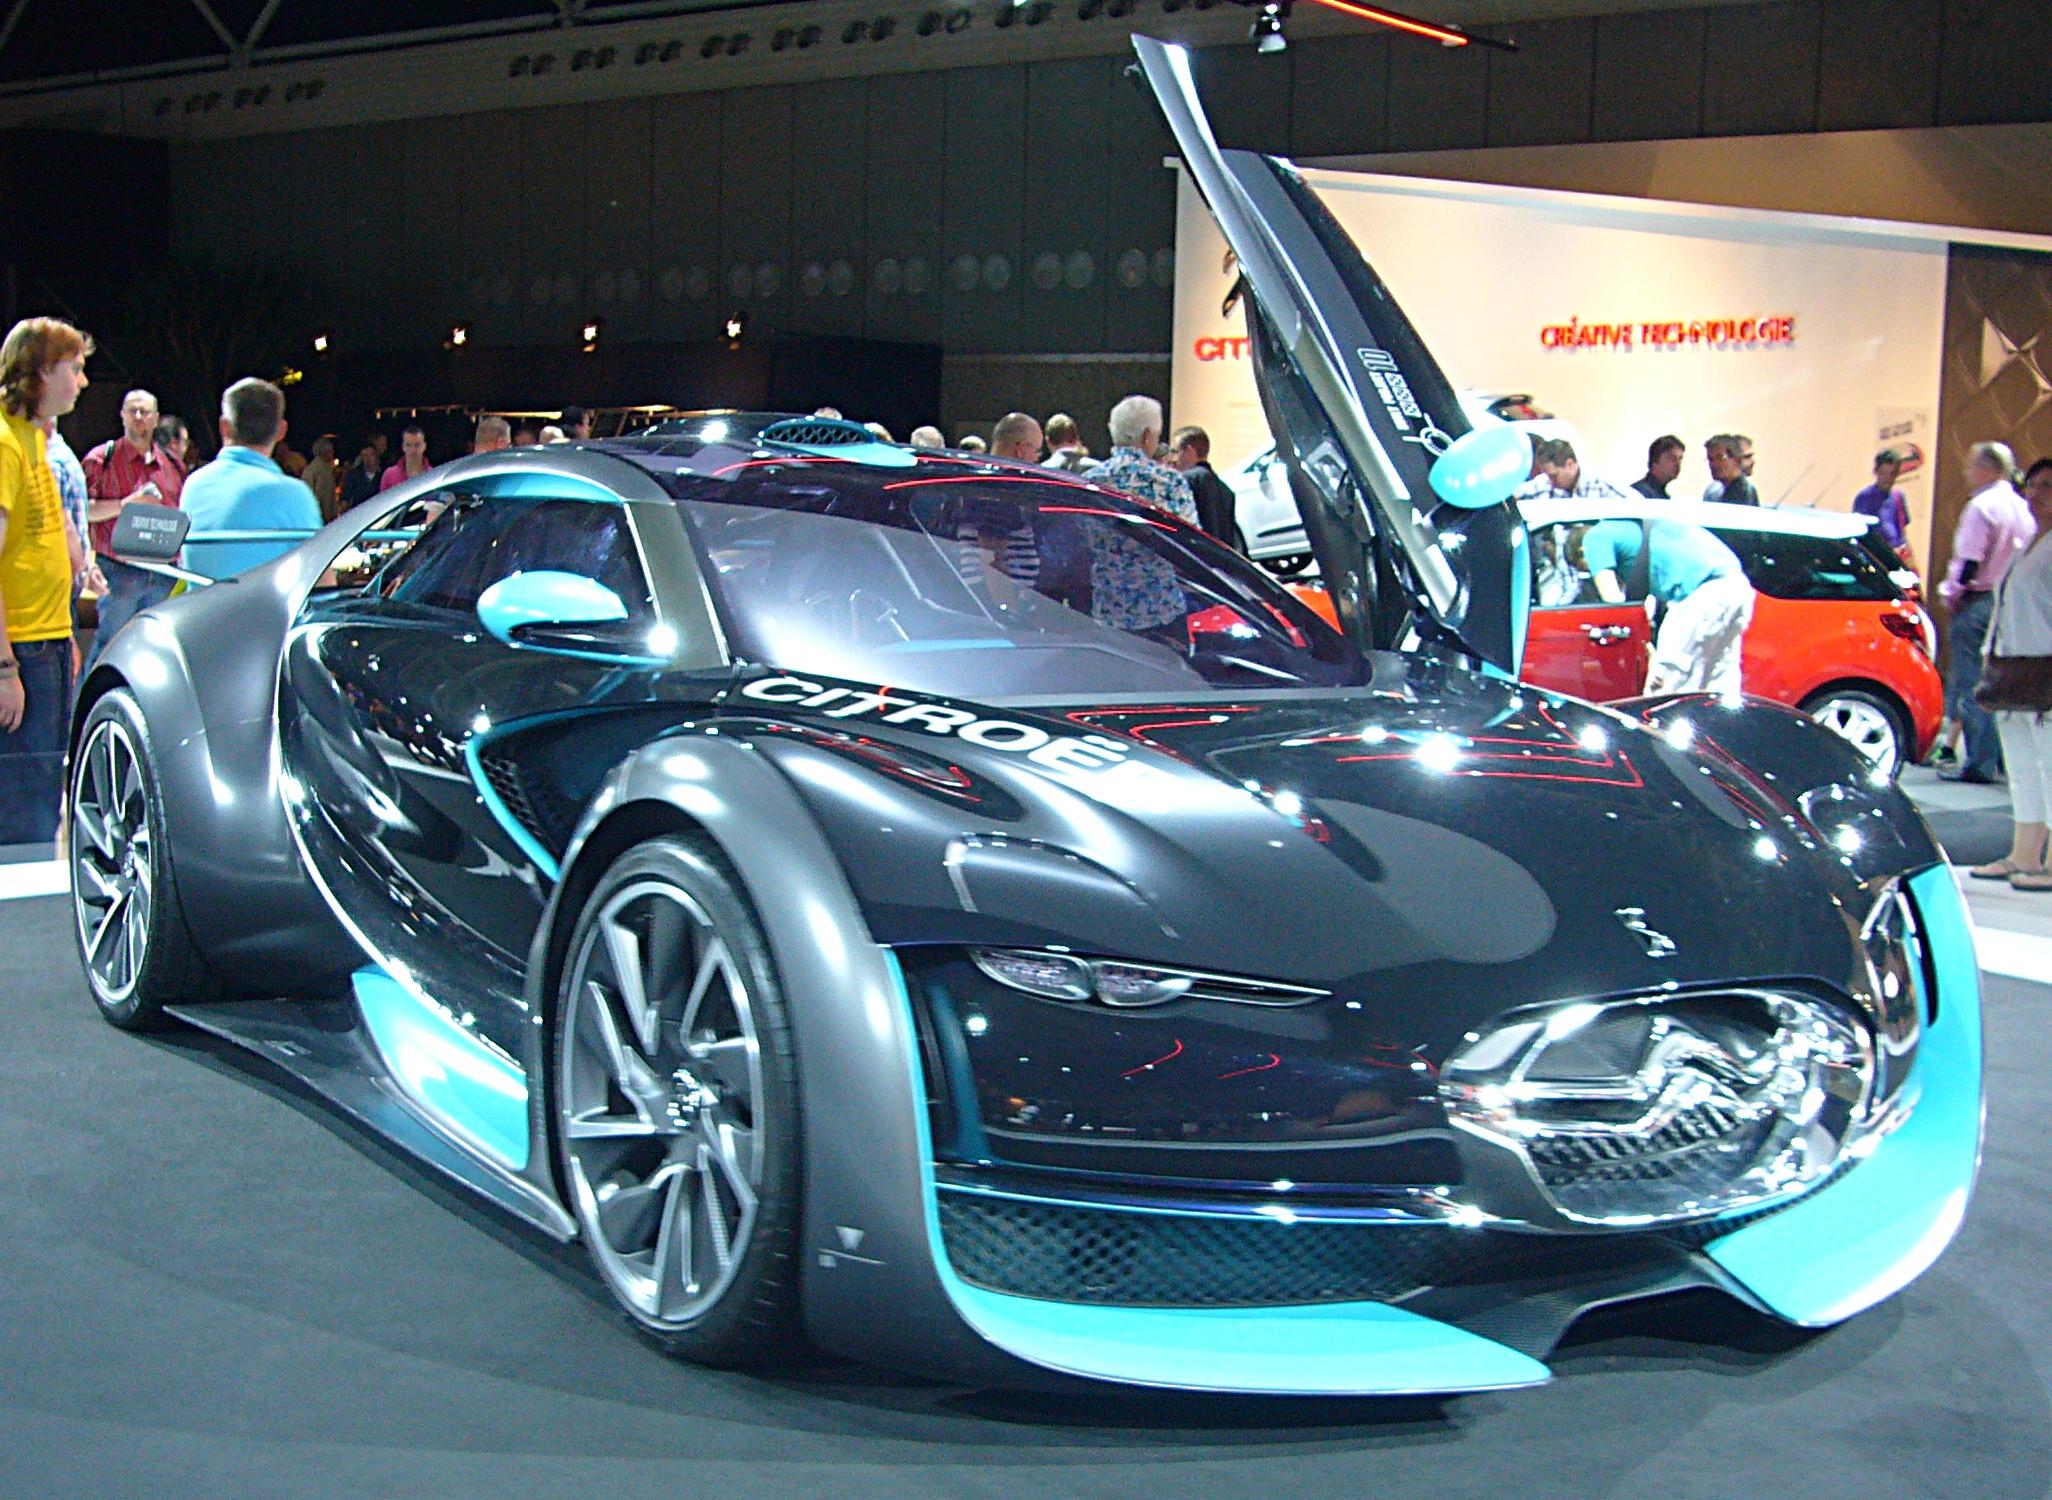 File:Citroën Survolt (front).jpg - Wikimedia Commons